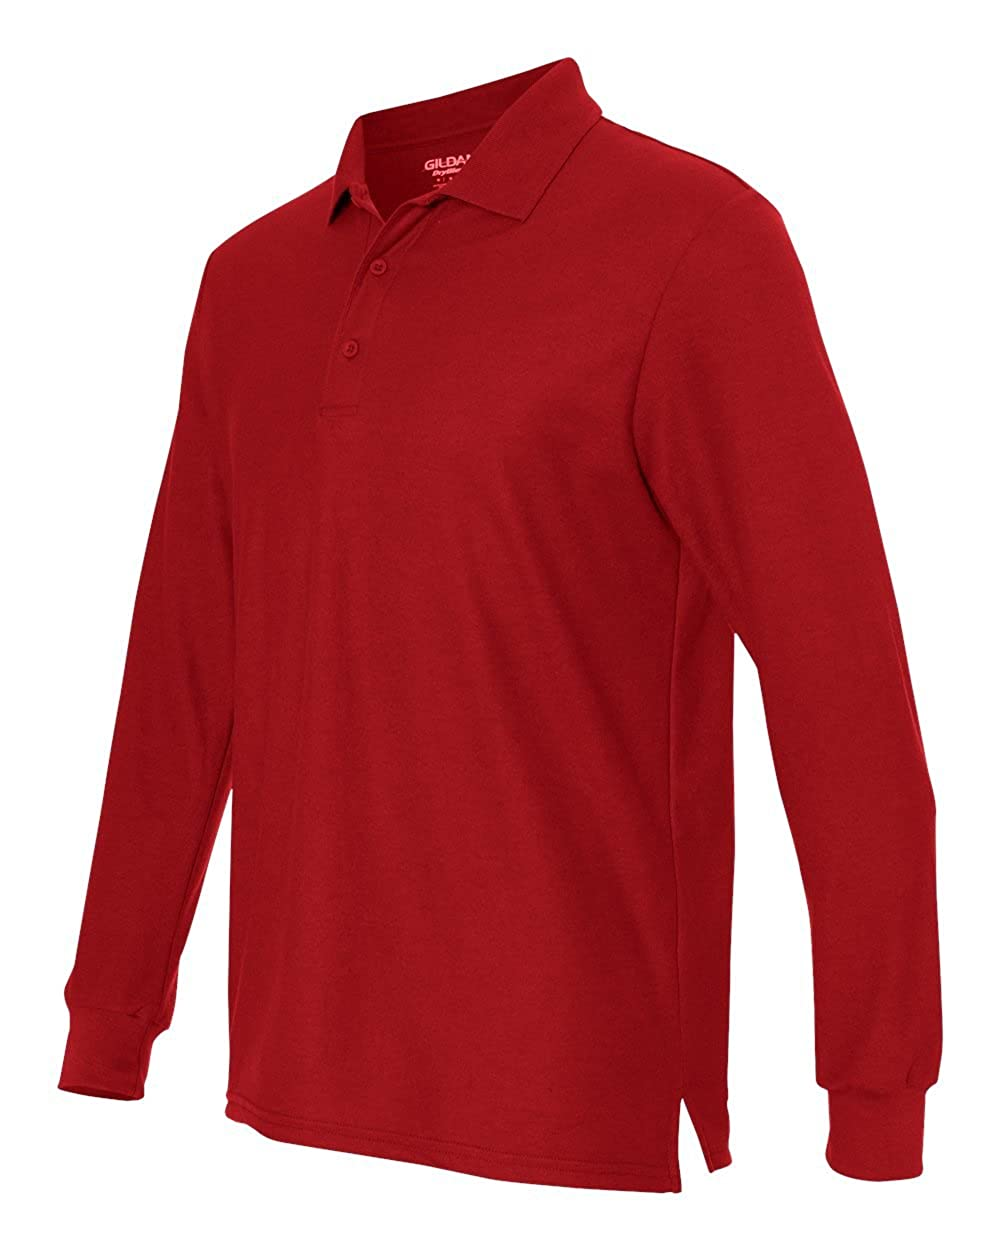 M G729 Pack of 12 Red Gildan DryBlend Double Piqu Long-Sleeve Polo